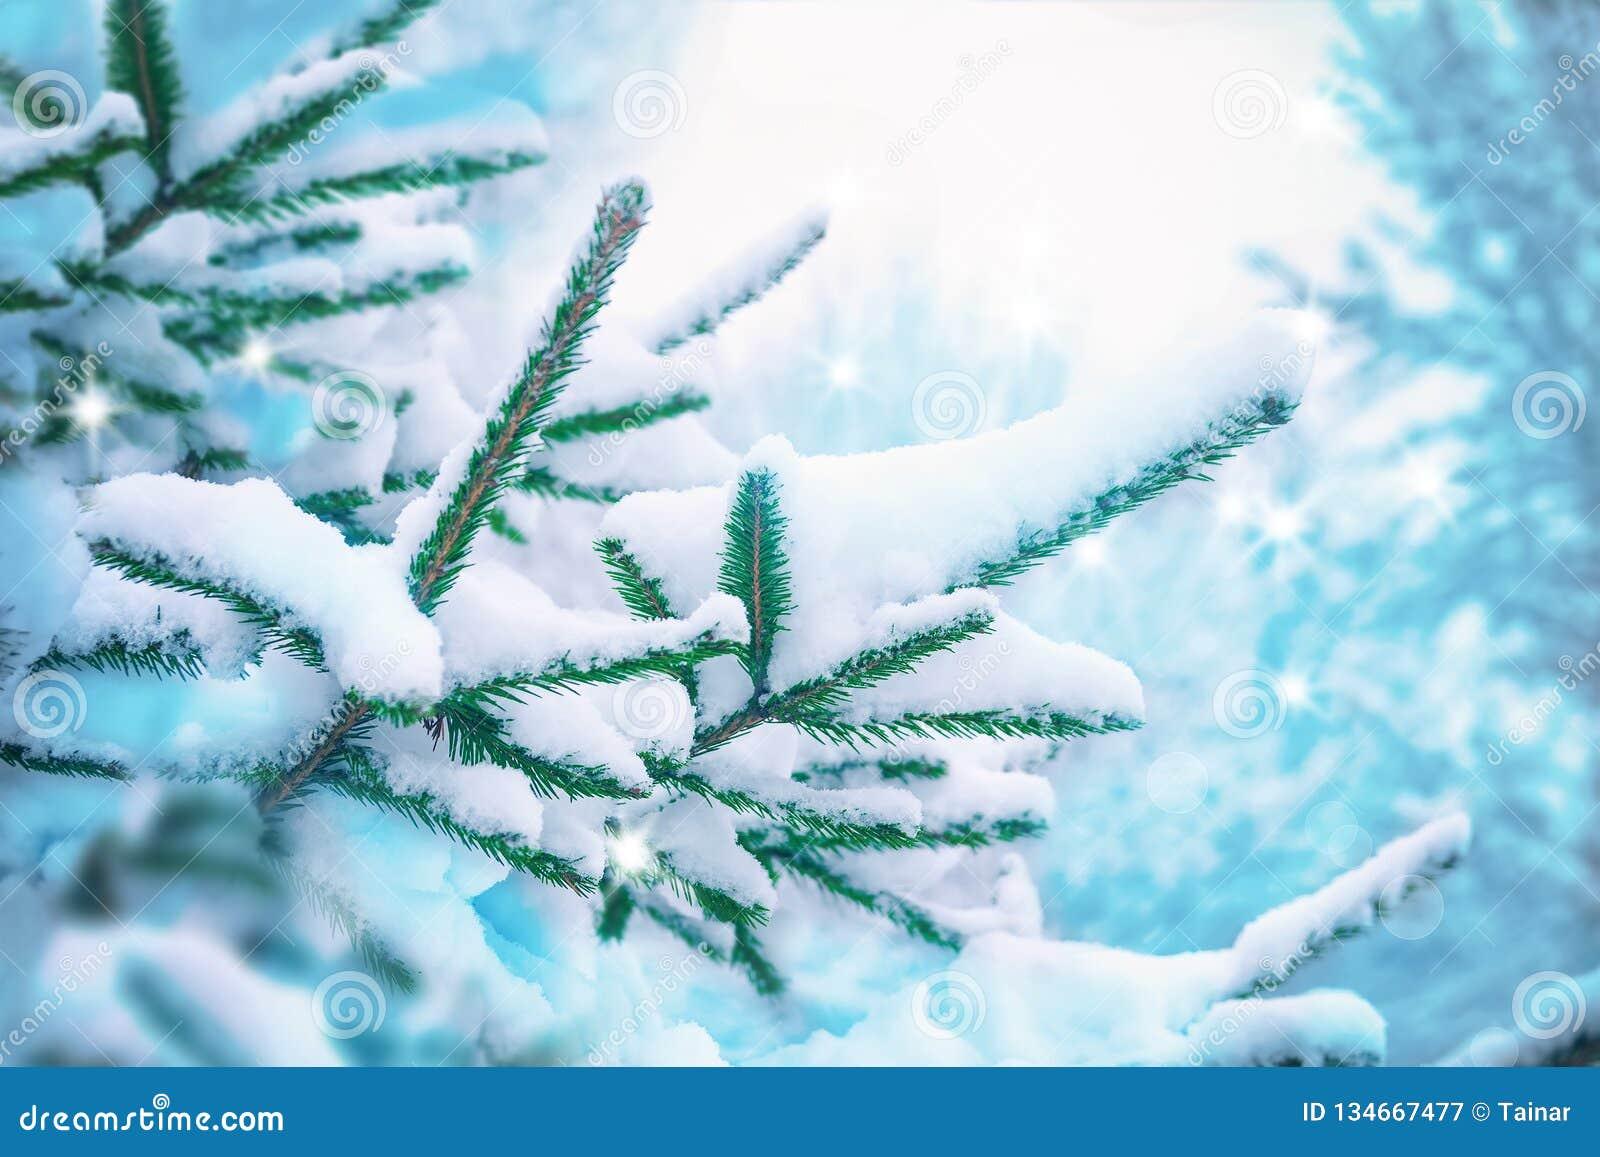 Beautiful Fir Tree Covered Snow, Closeup  Winter Christmas Scenic